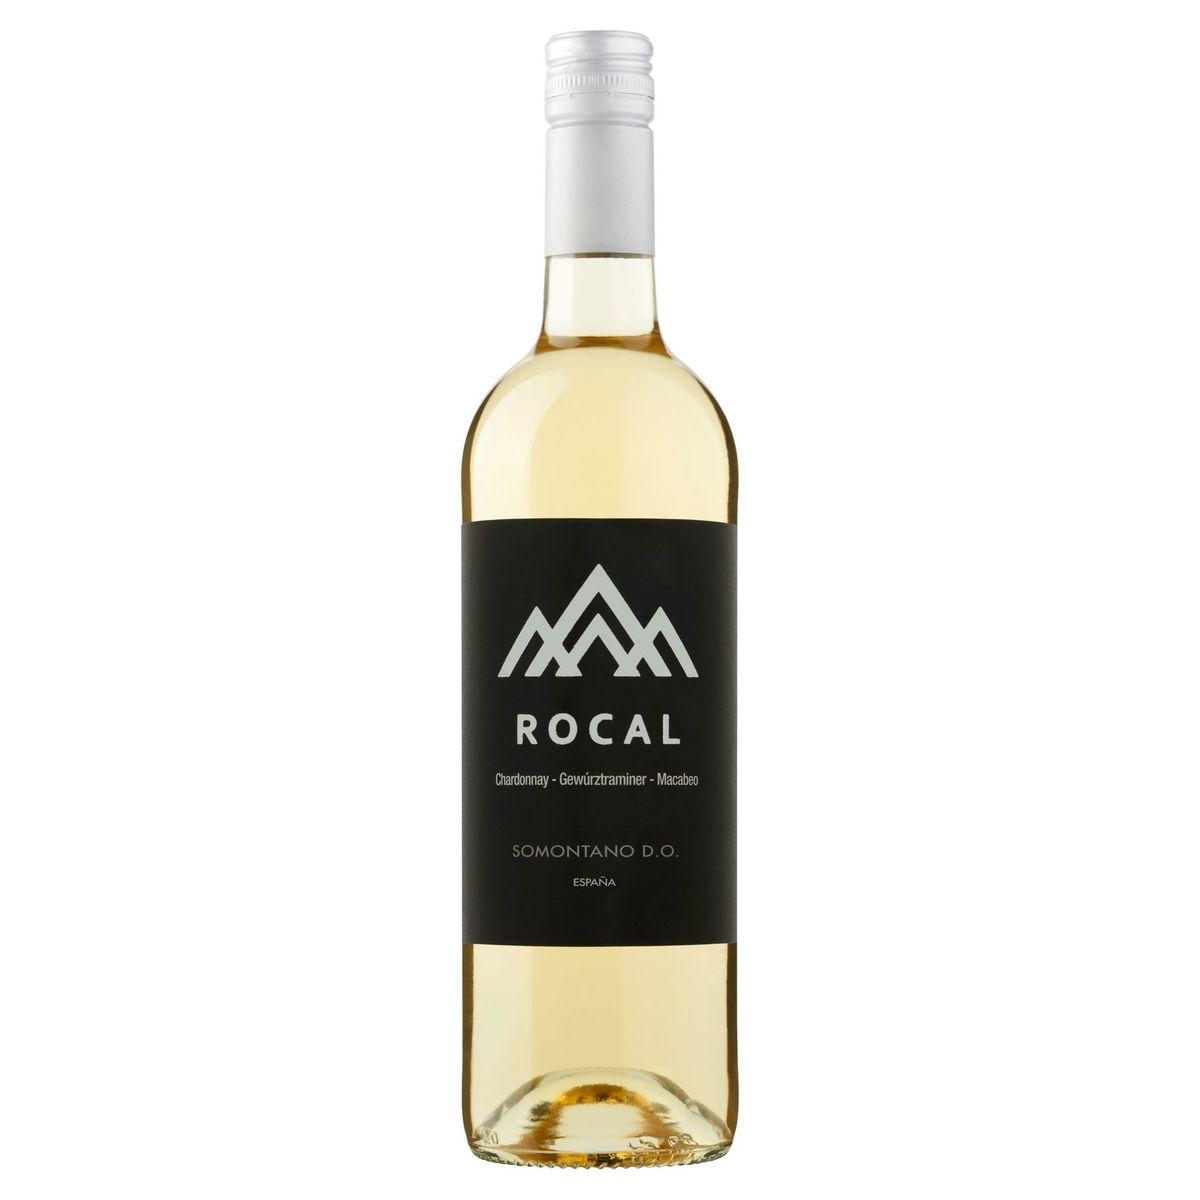 Rocal Chardonnay Gewúrztraminer Macabeo 750 ml